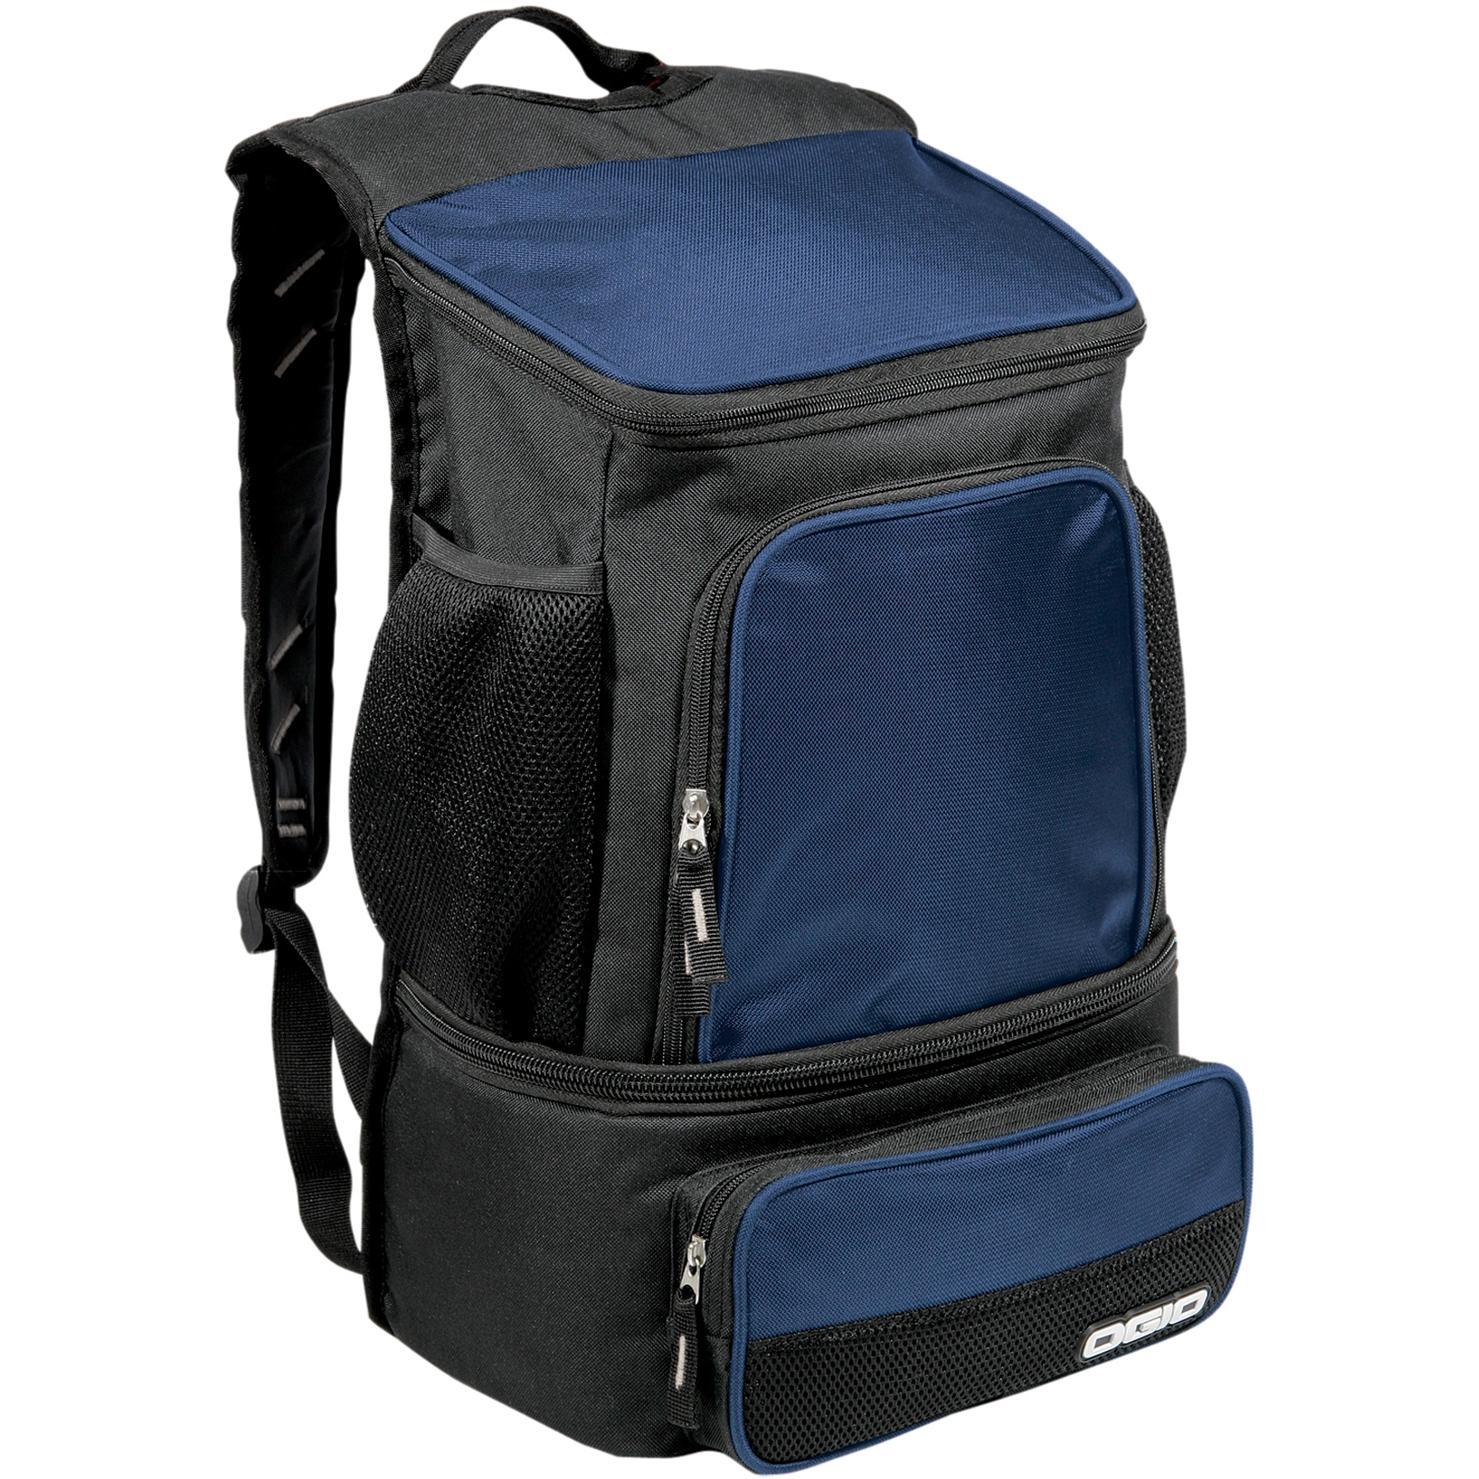 OGIO Freezer Cooler Bag - Navy